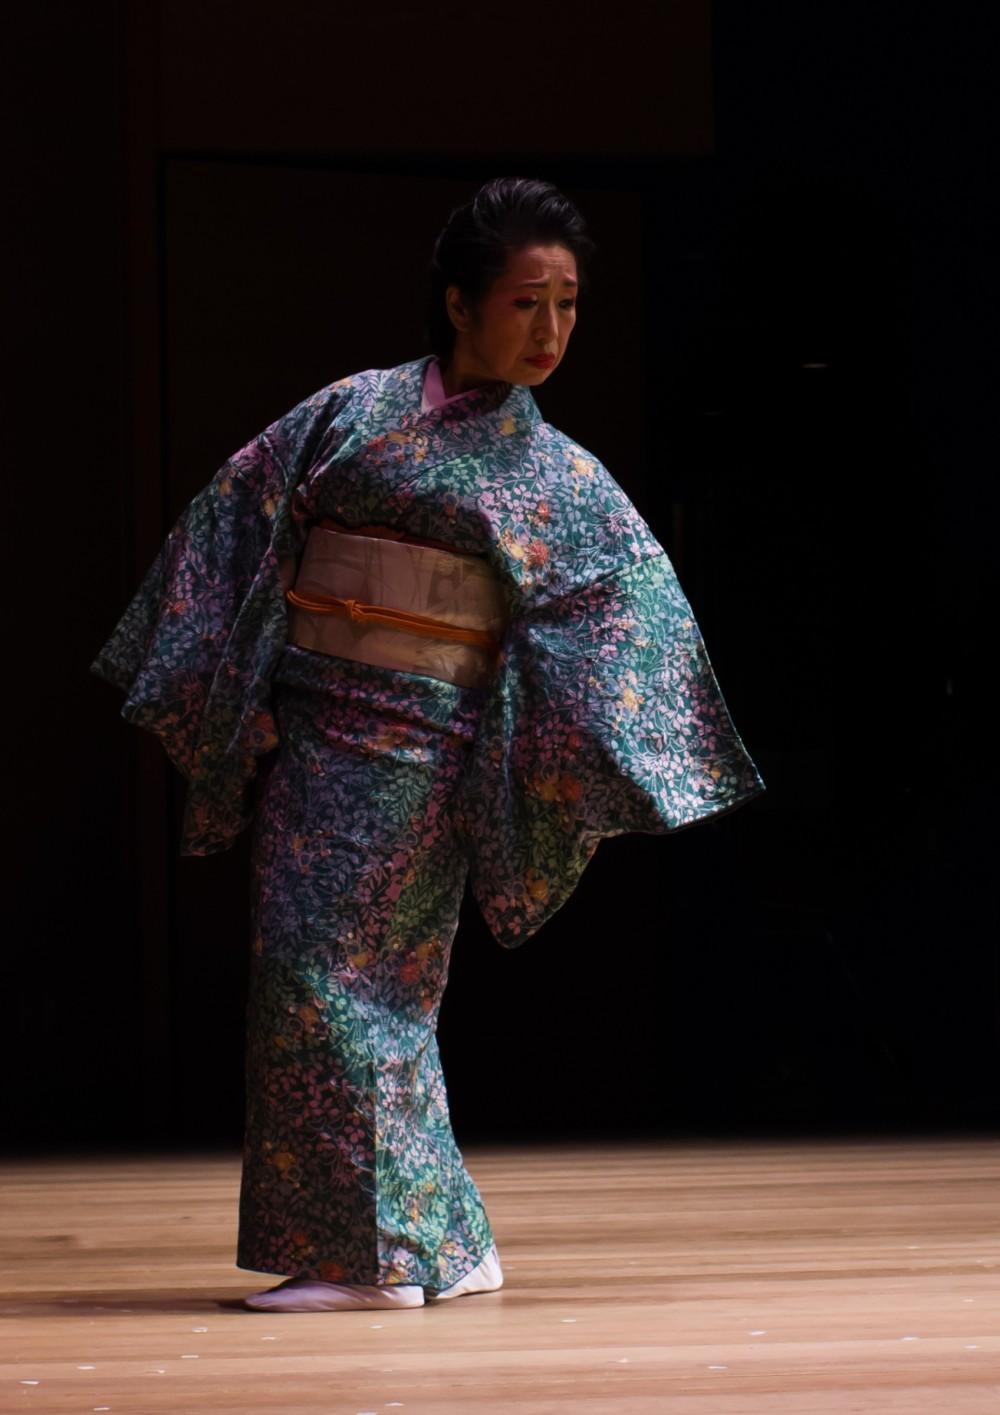 2011 Kozue no Kai Dance Recital XV